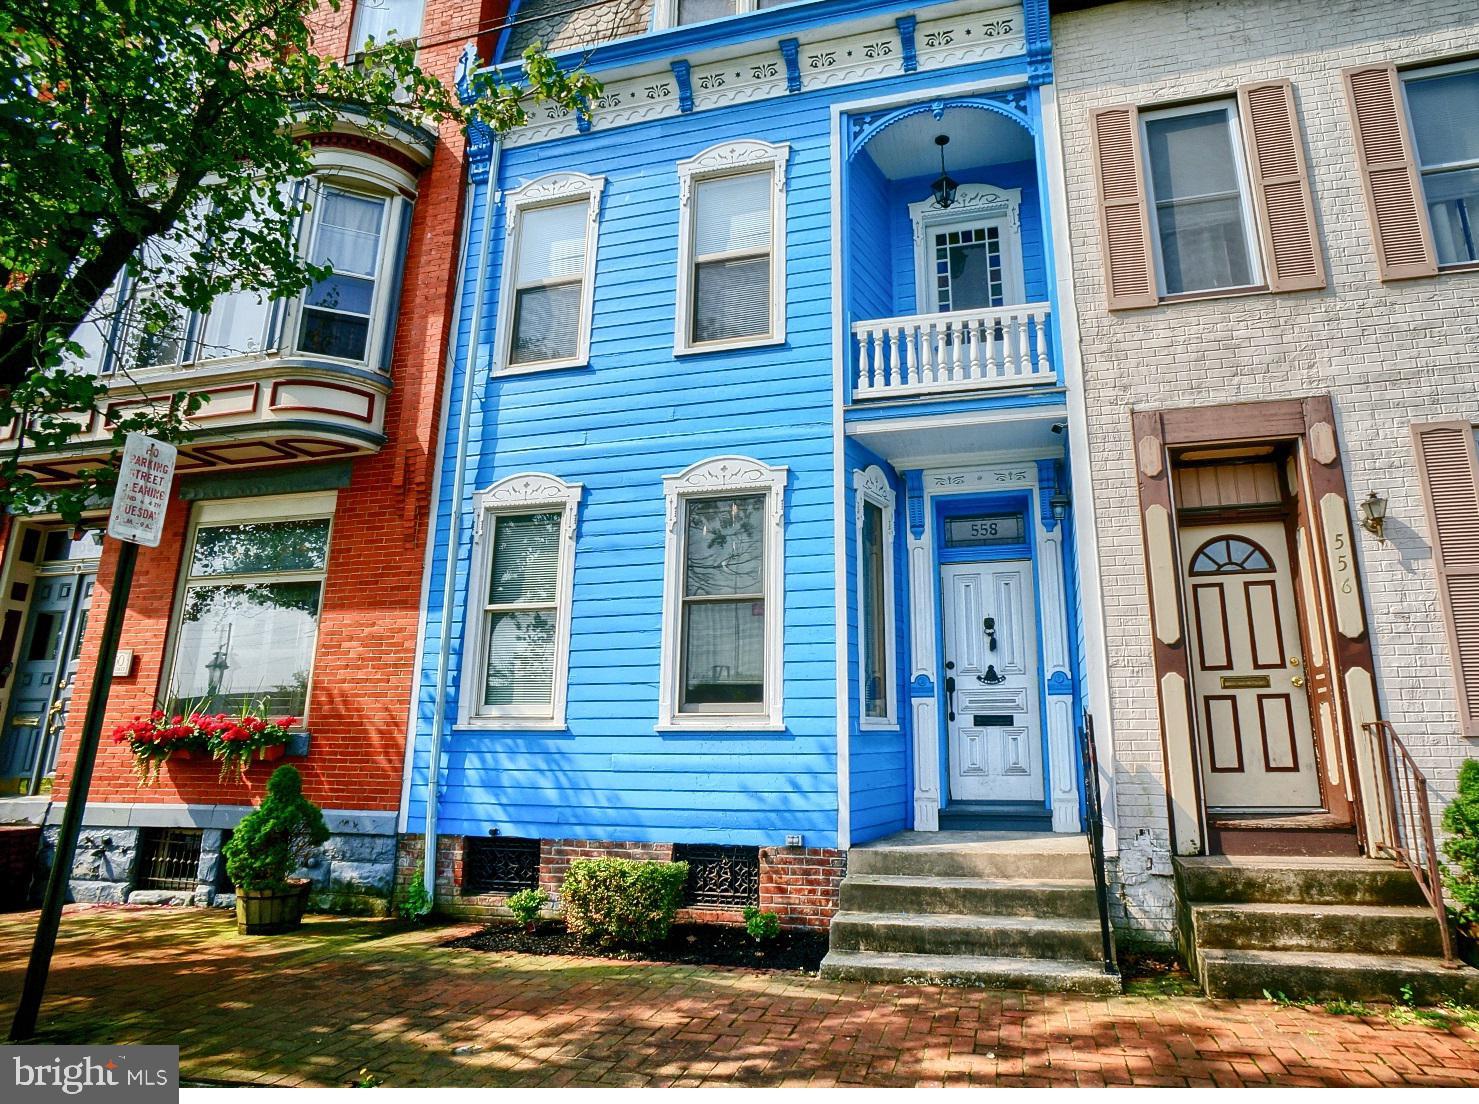 558 RACE STREET, HARRISBURG, PA 17104